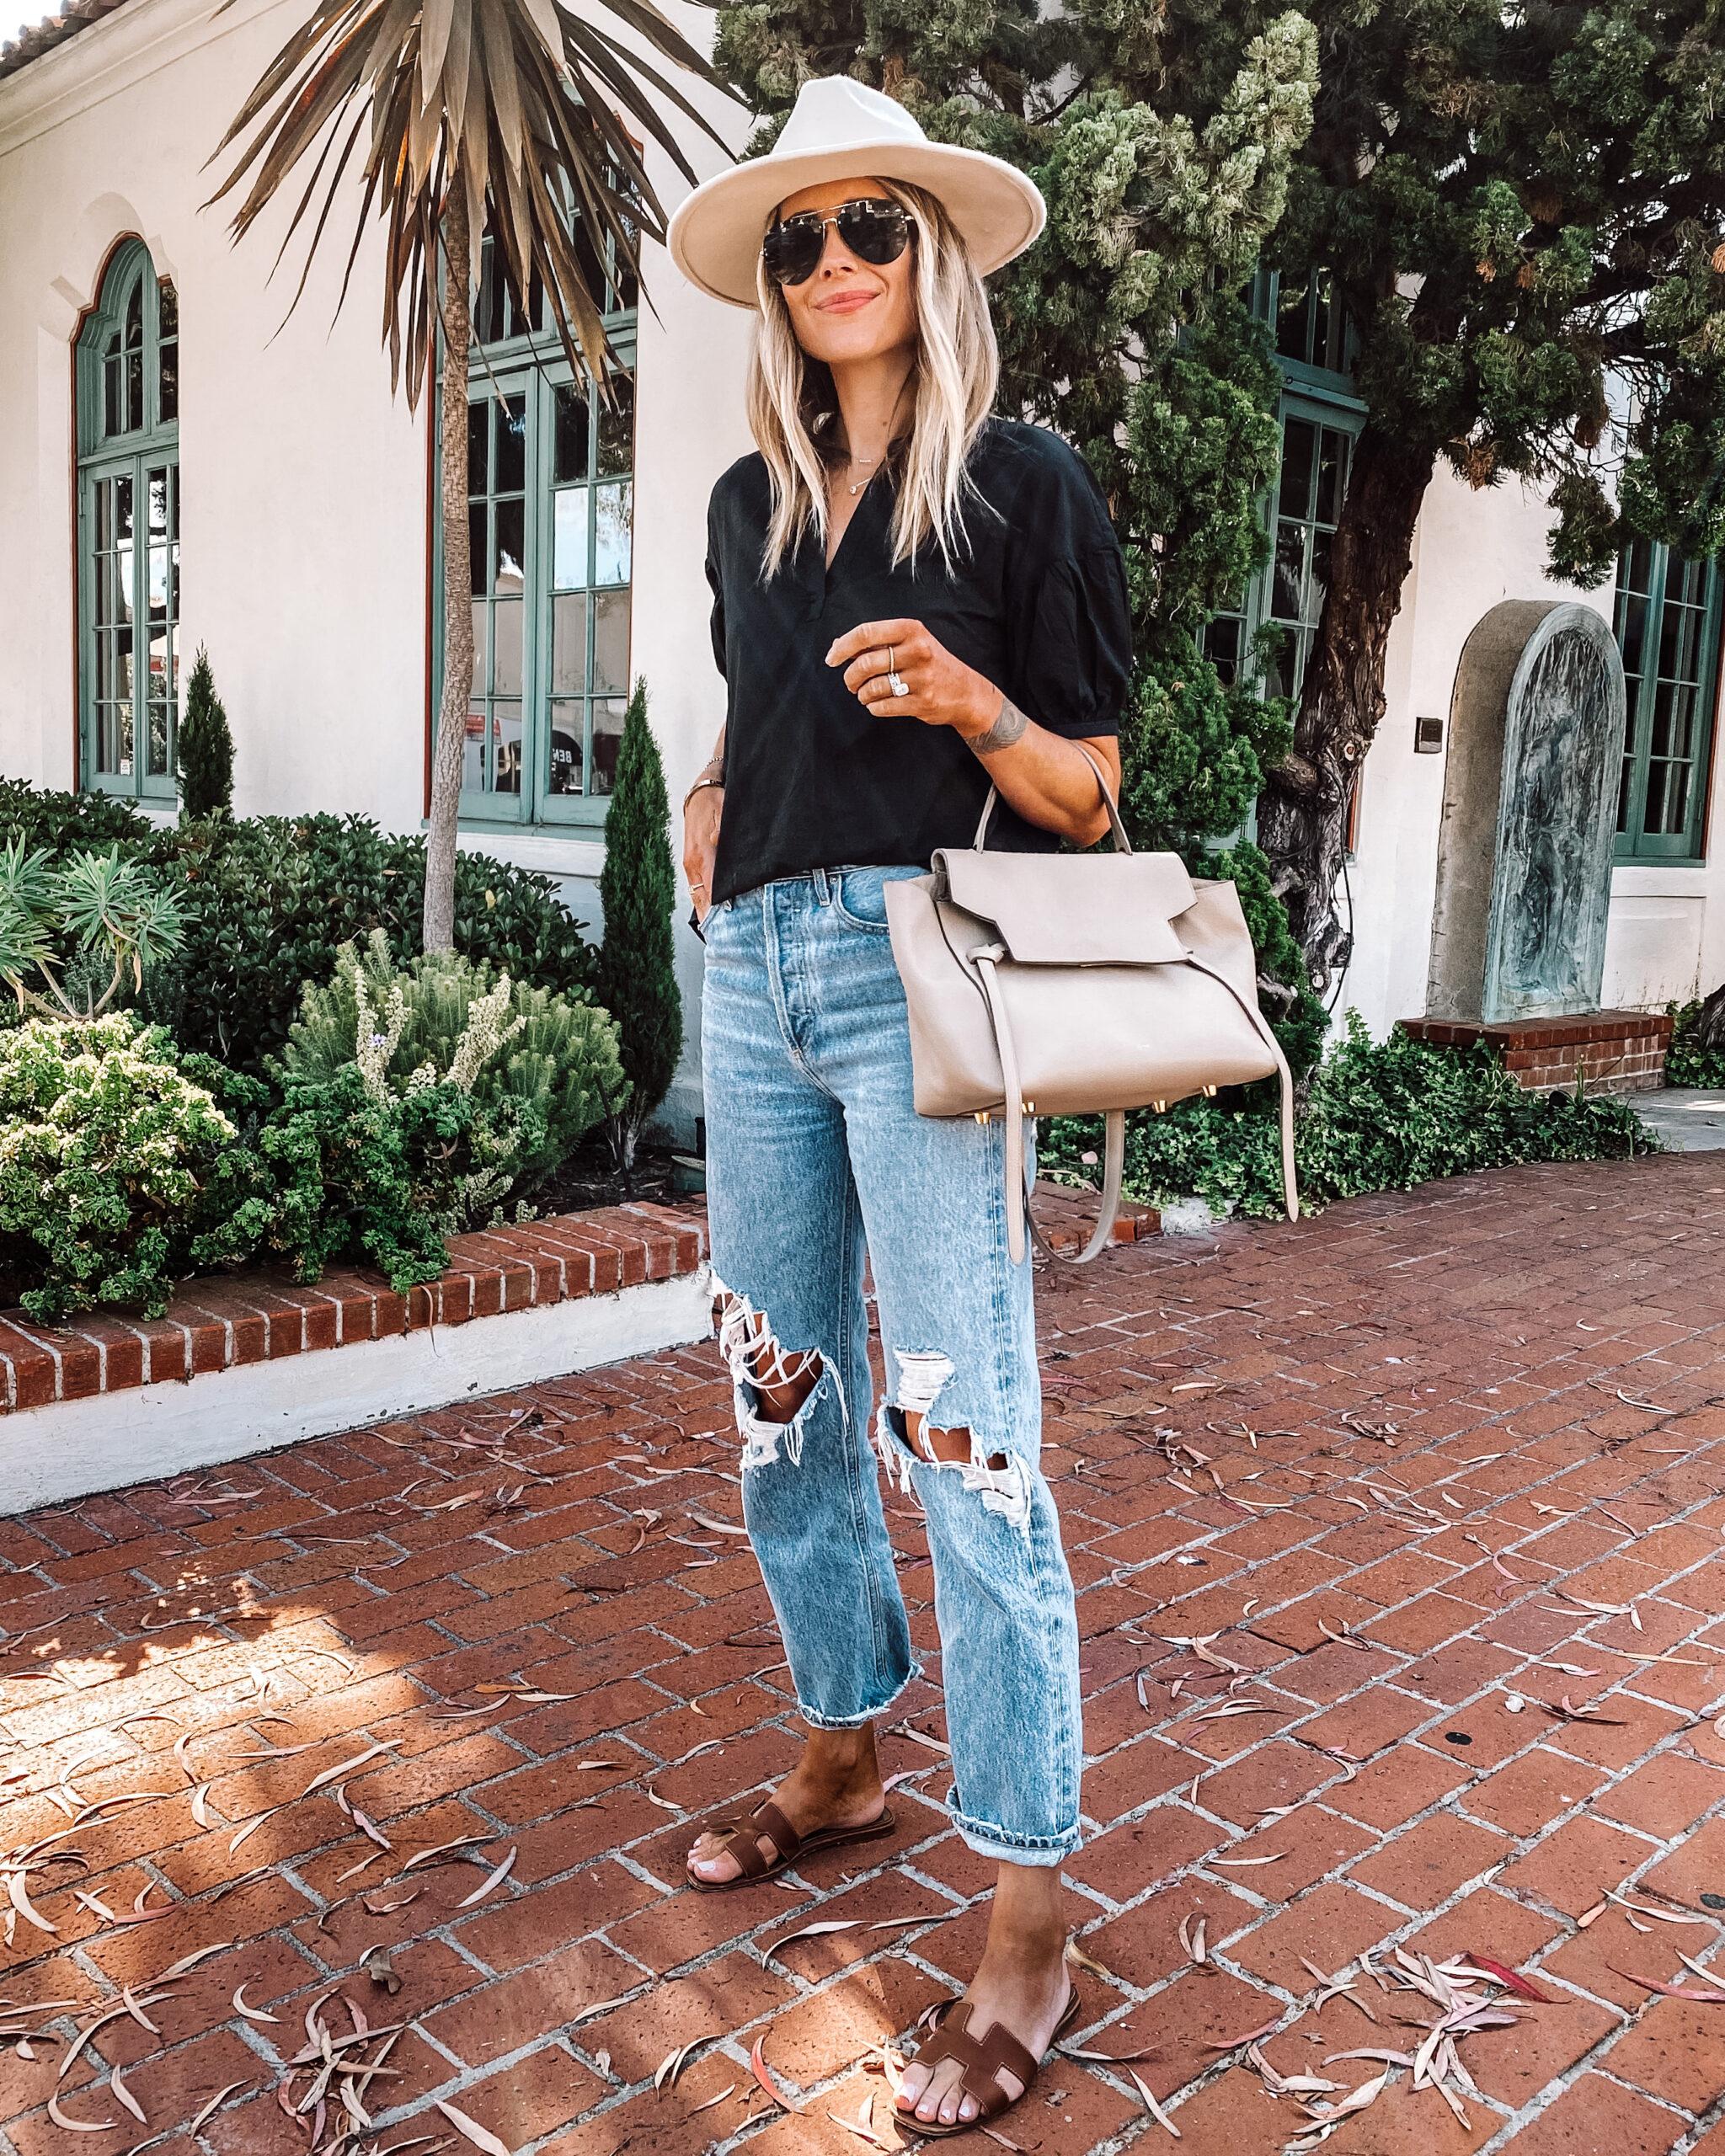 Fashion Jackson Wearing Black Puff Sleeve Shirt AGOLDE 90s Ripped Jeans Beige Hat Hermes Tan Sandals Celine Mini Belt Bag Summer Outfit